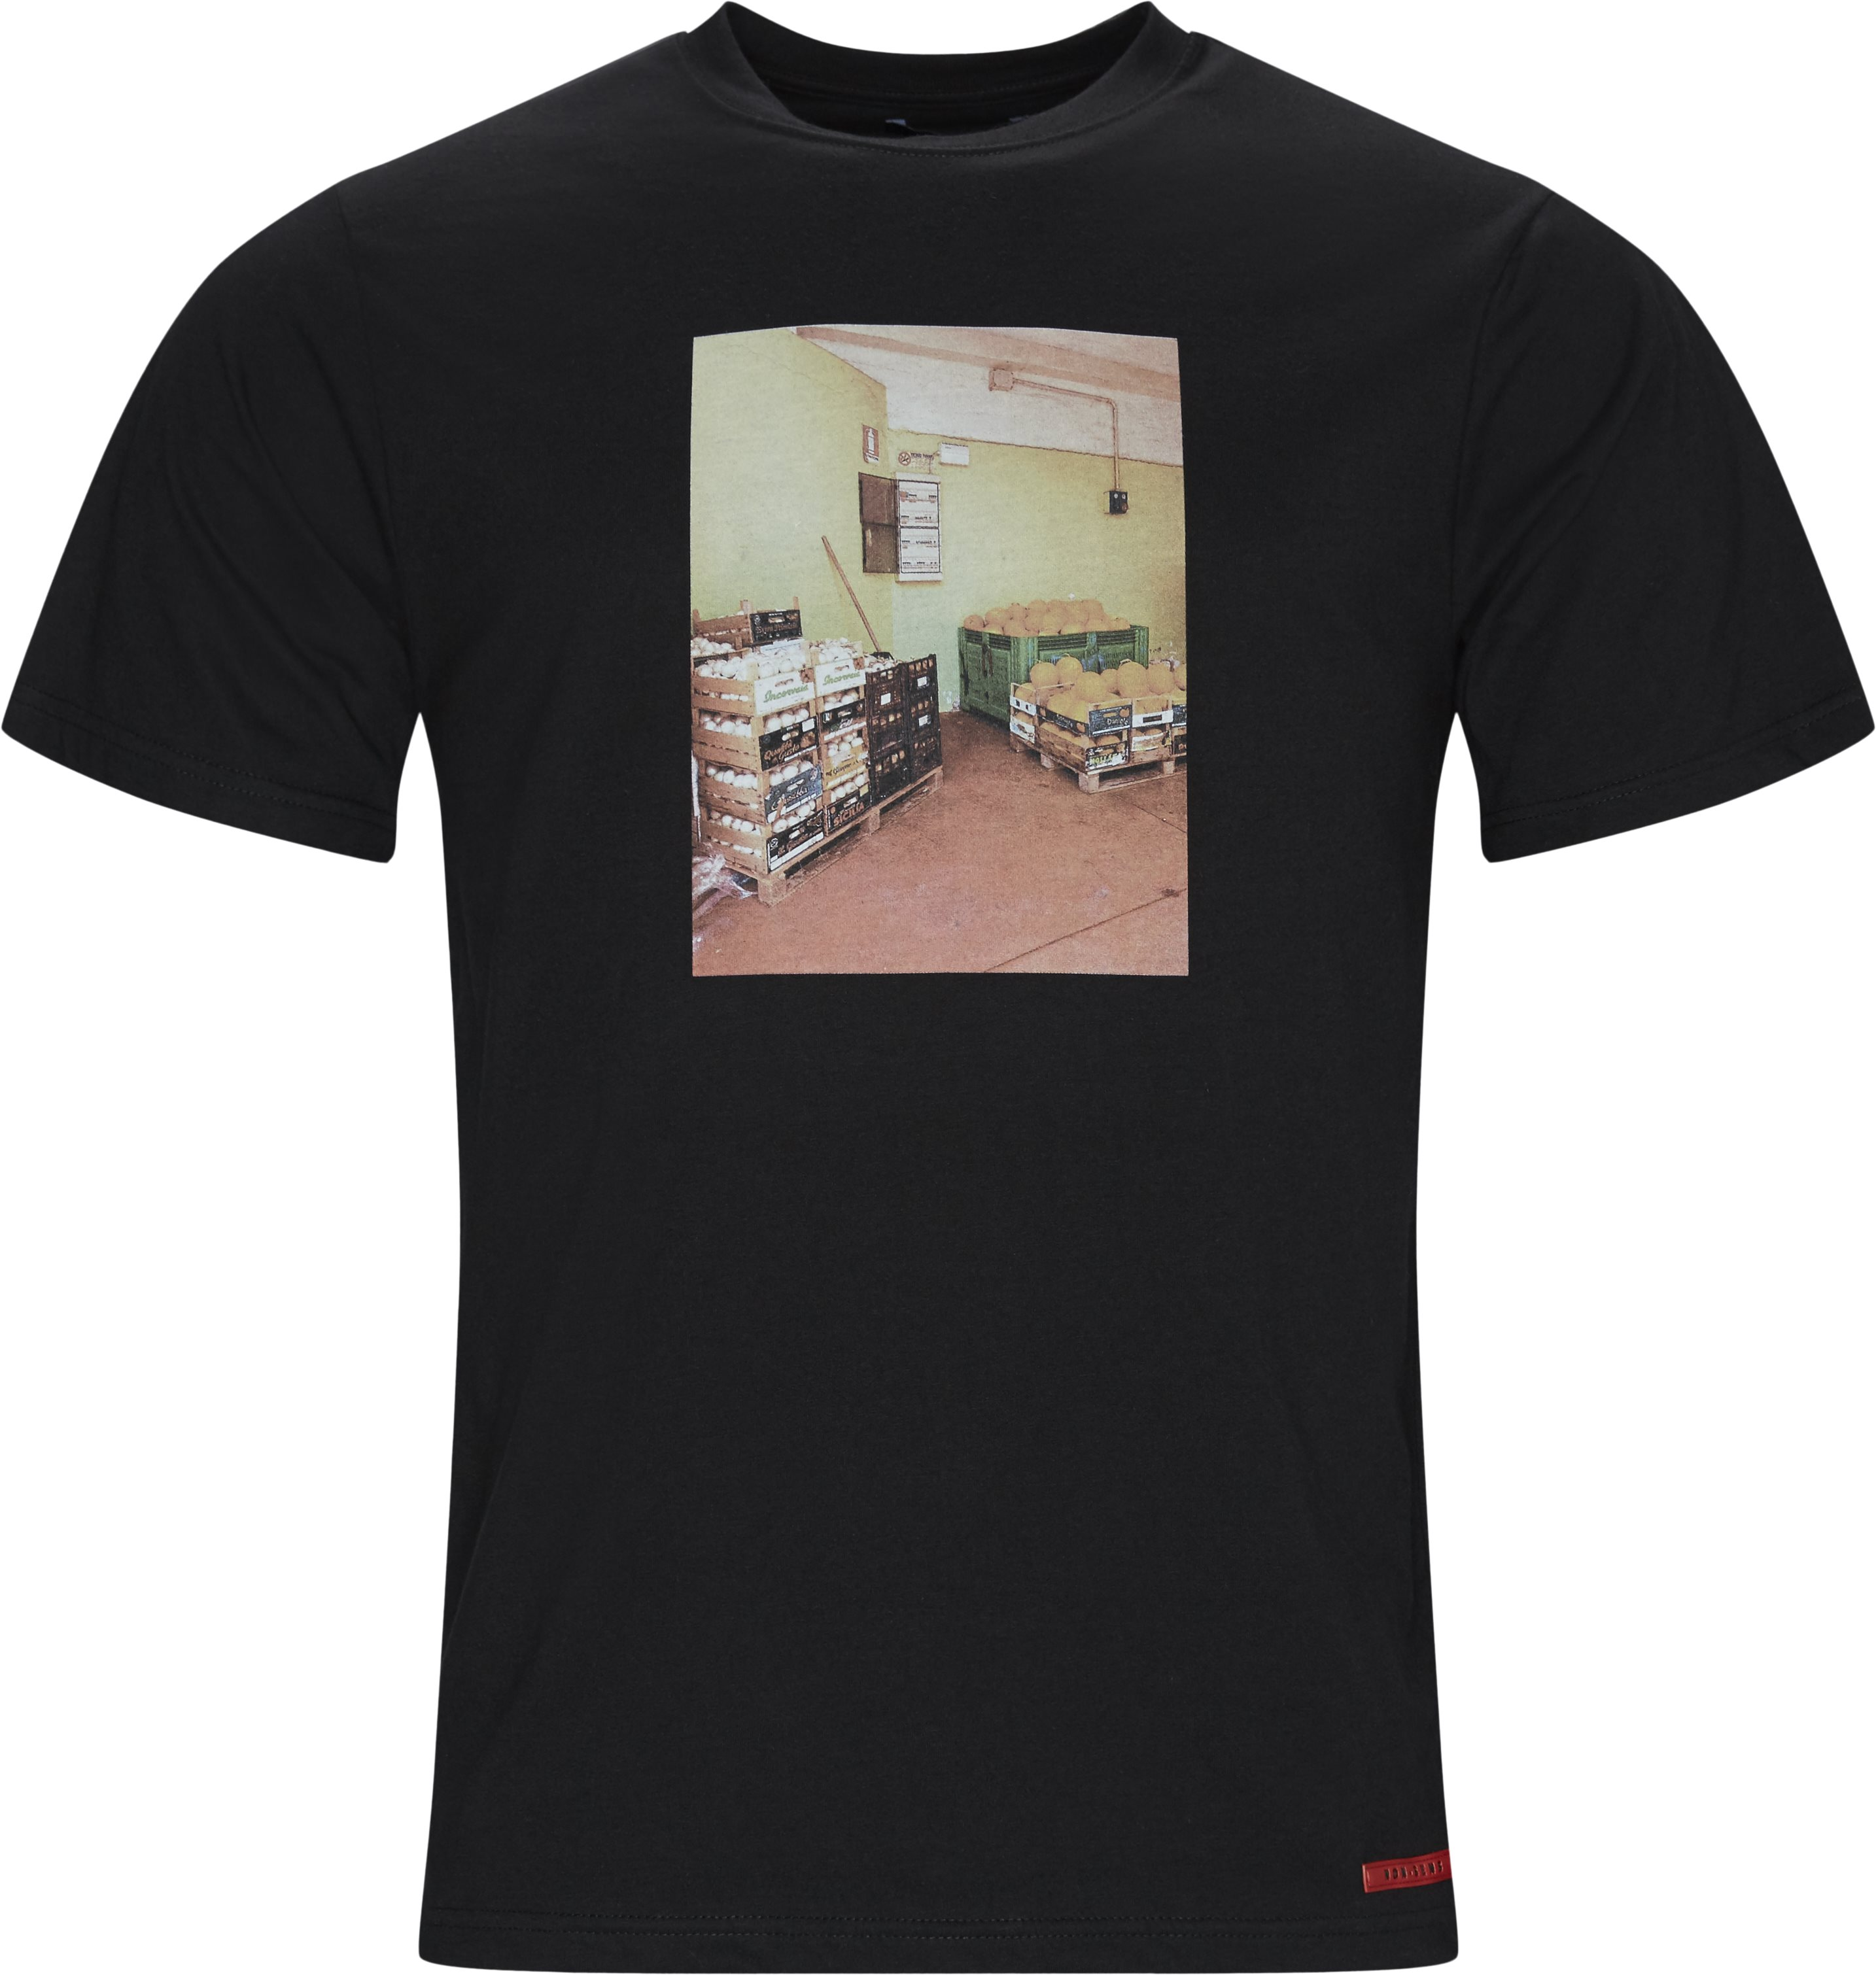 Crater Tee - T-shirts - Regular fit - Sort